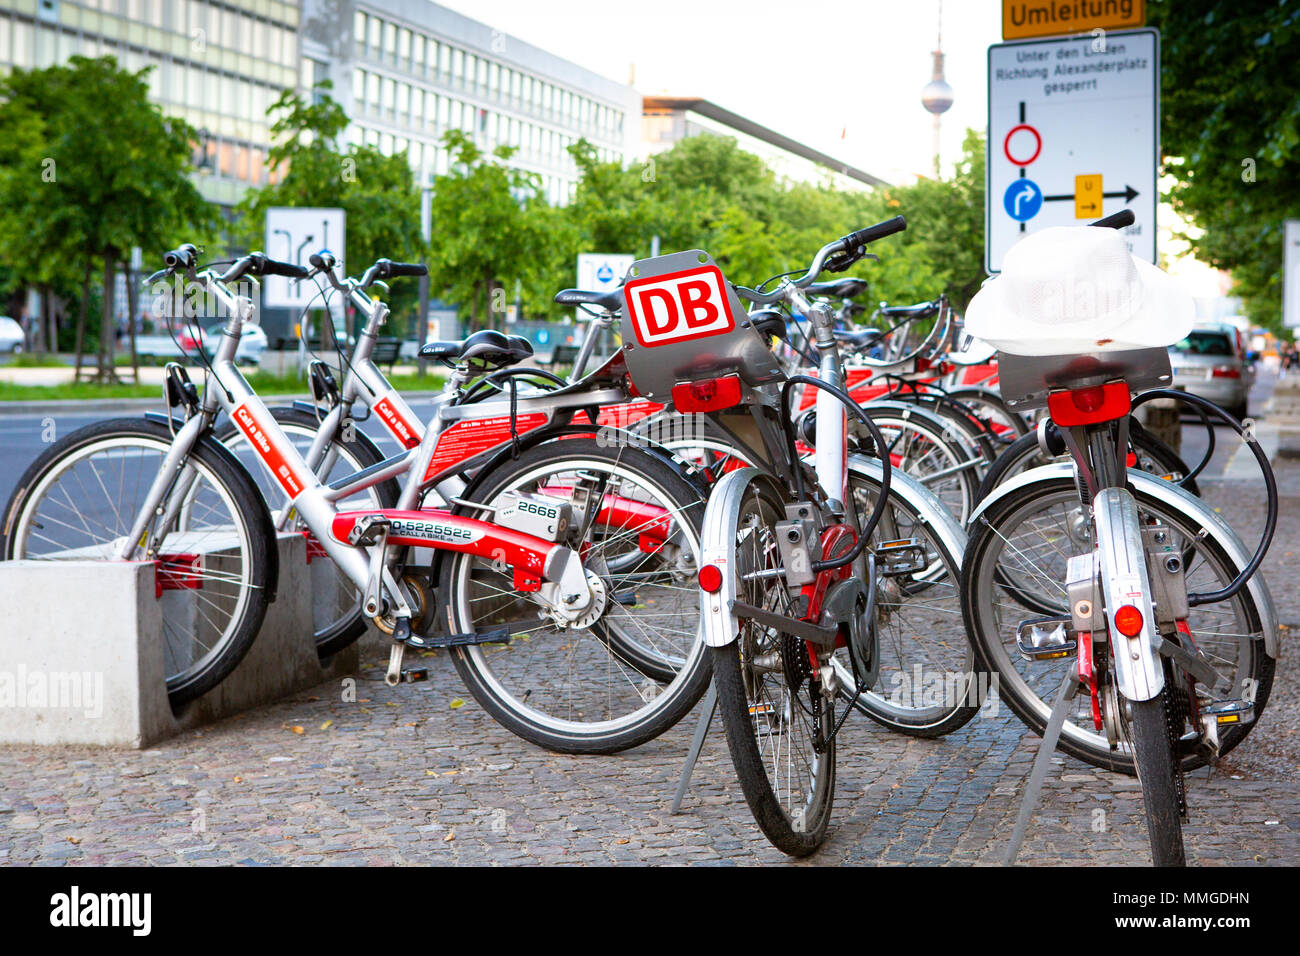 German Bicycle Company Stock Photos & German Bicycle Company